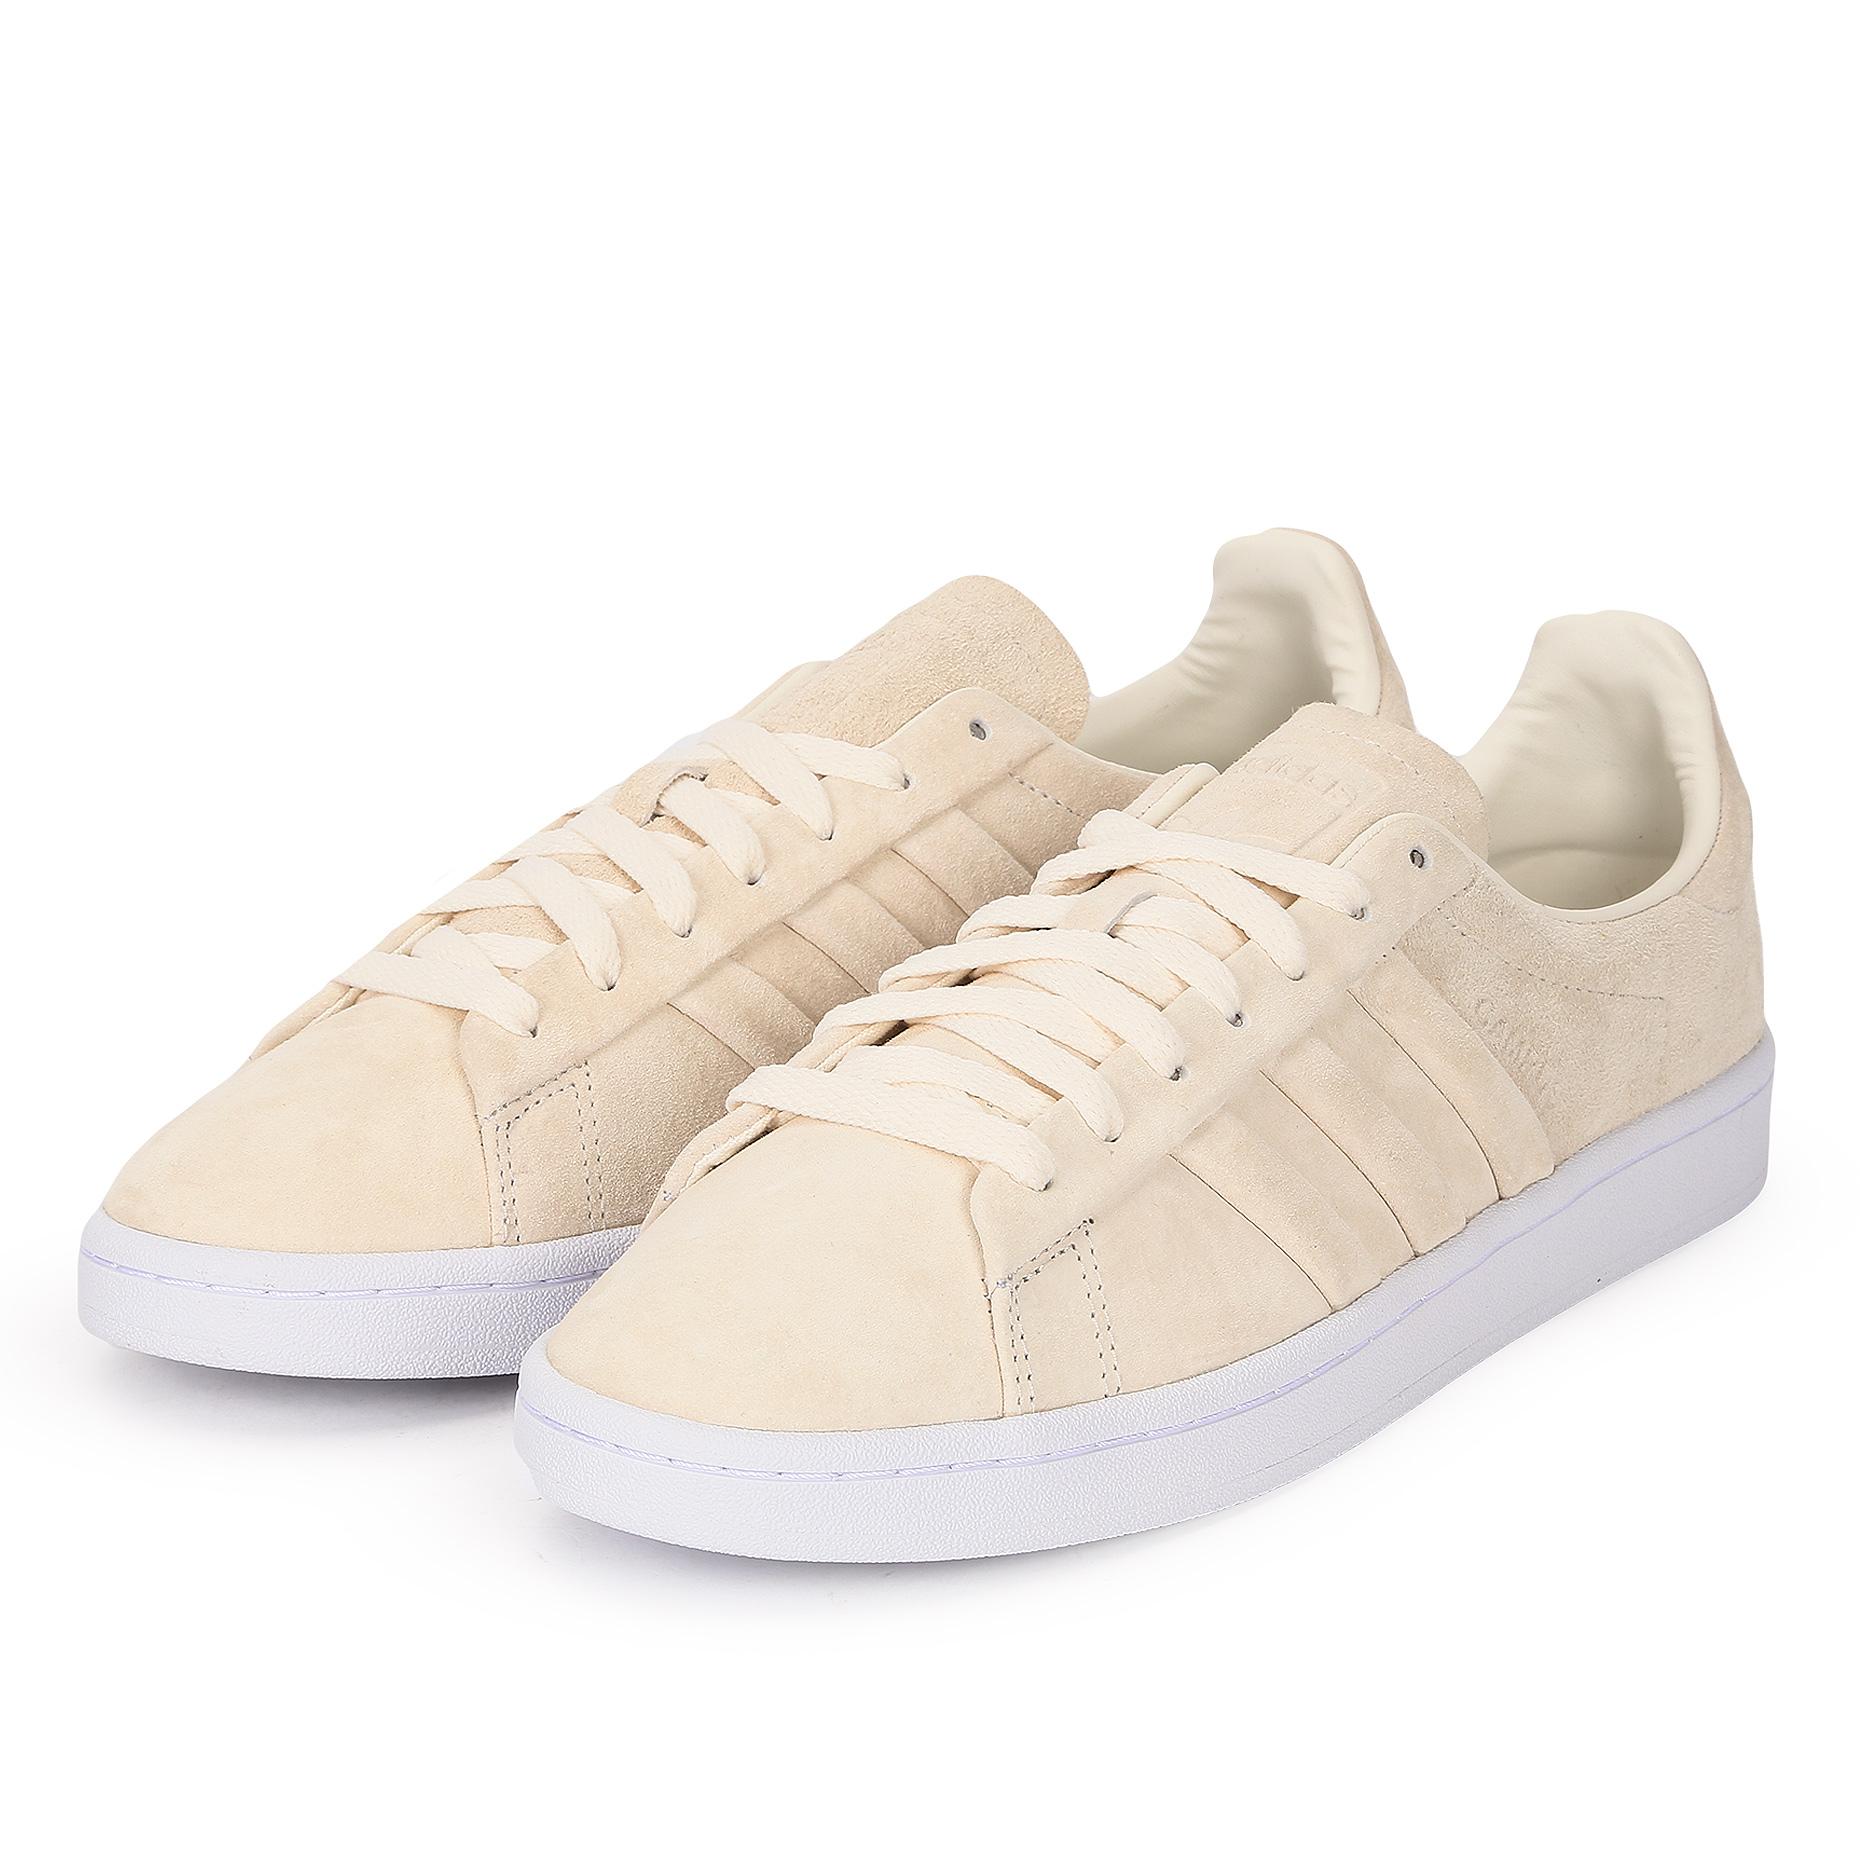 84e9cd4f74946d Мужские кроссовки adidas Originals Campus Stitch And Turn White - фото 2